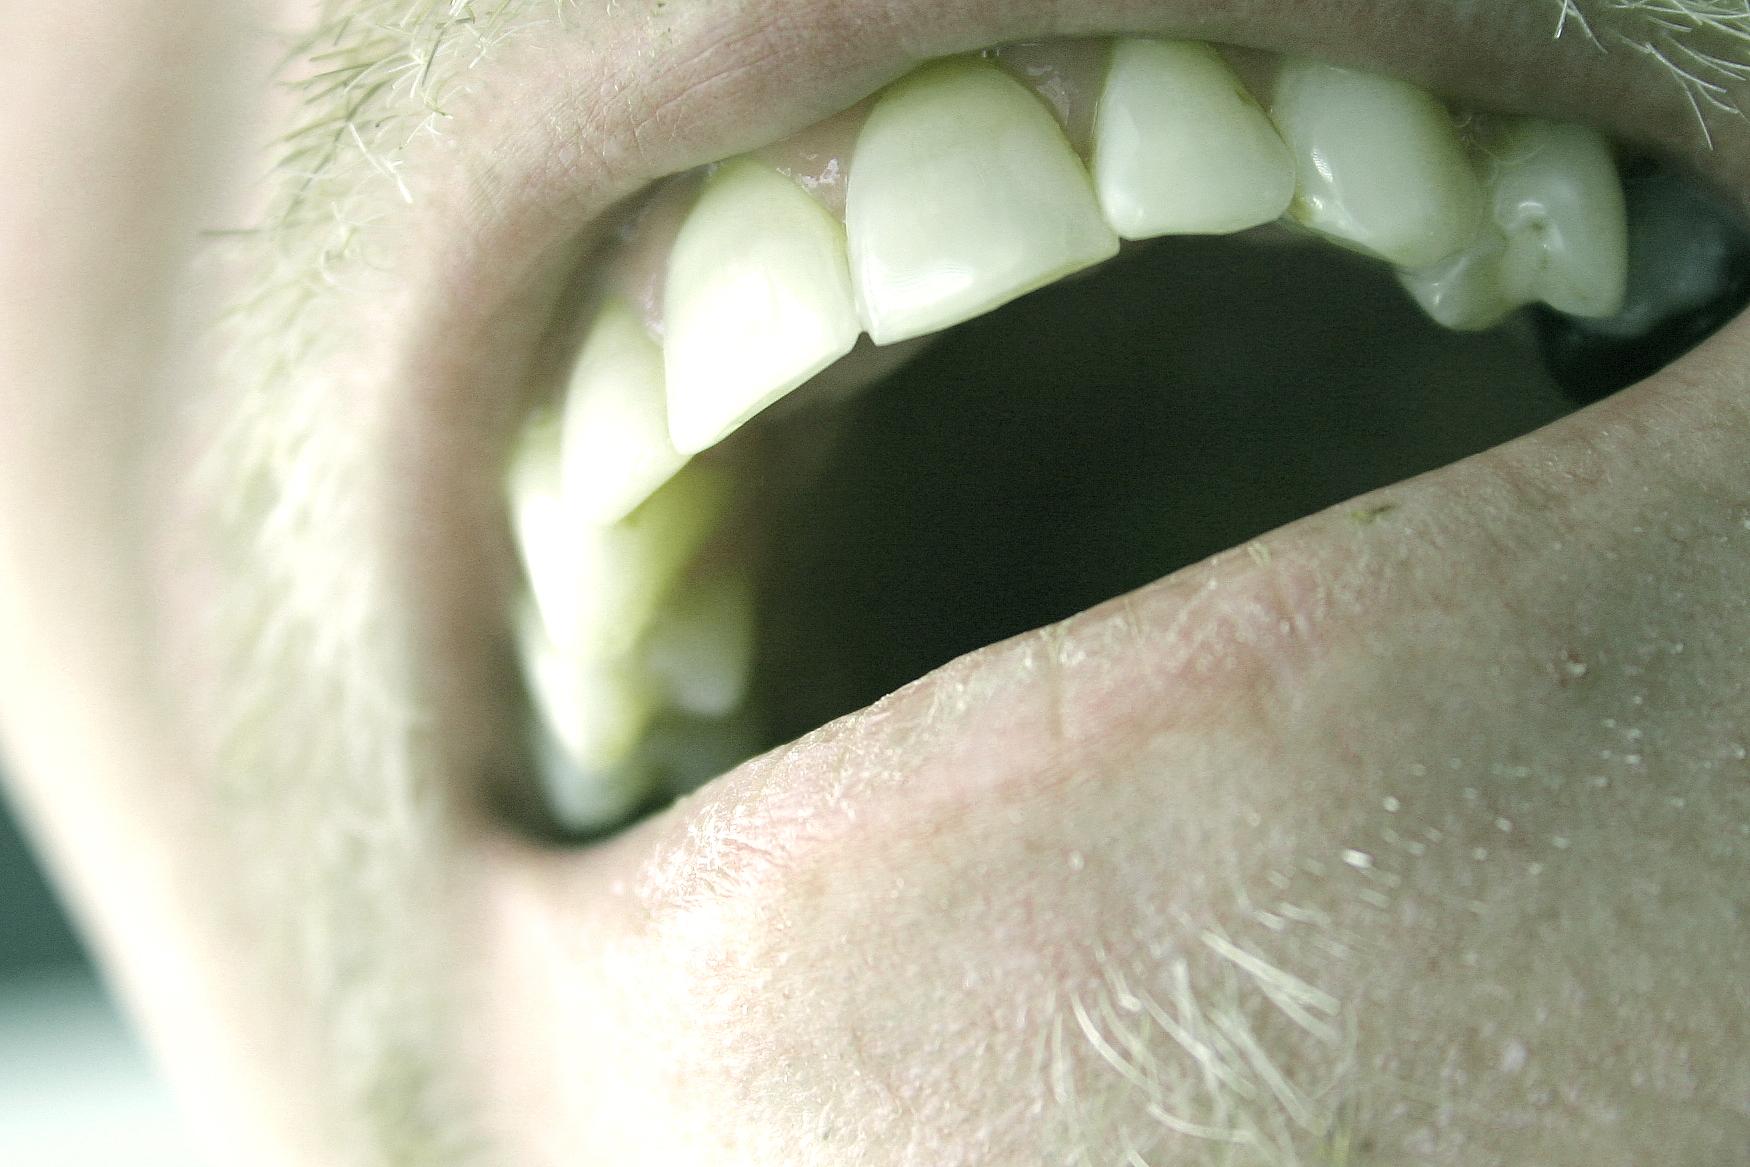 man-open-smile-with-teeth.jpg